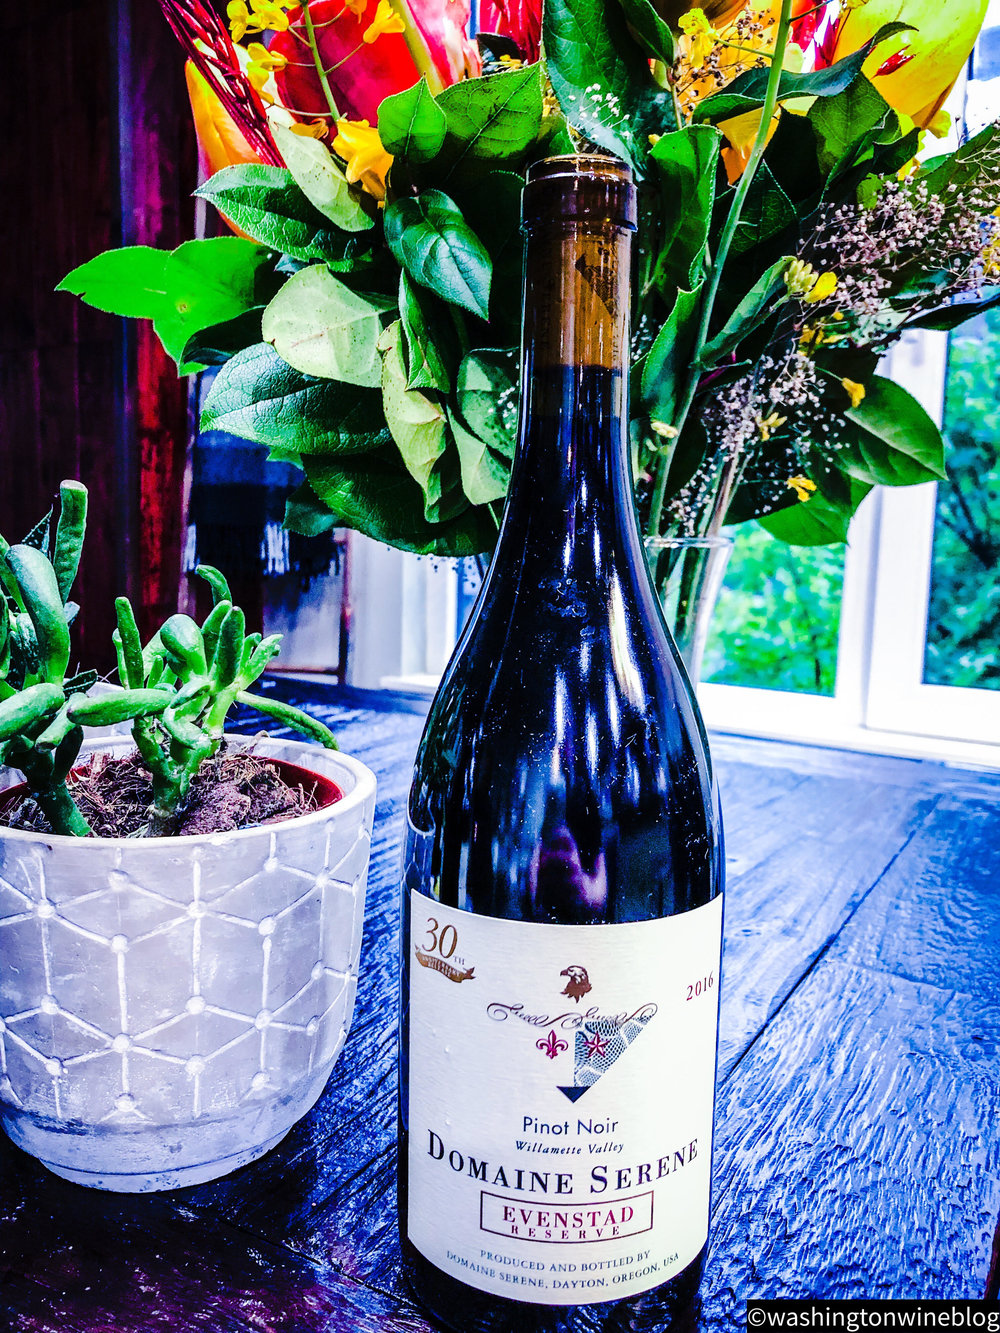 Domaine Serene 2016 Evenstad Pinot Noir.jpeg